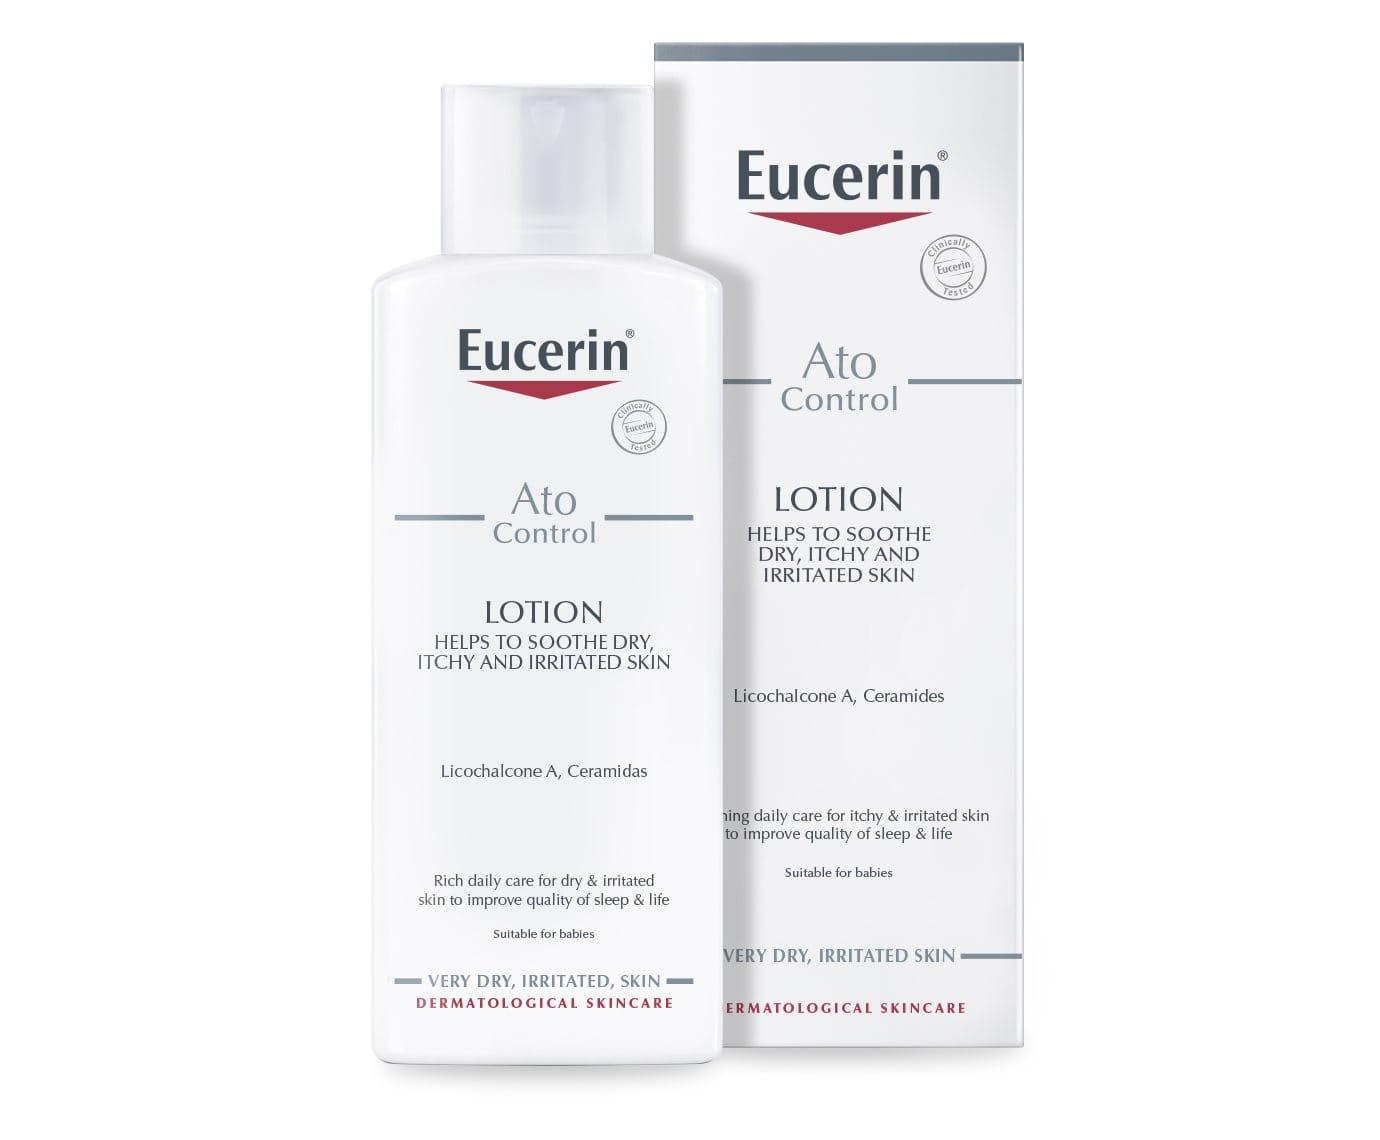 Atopicontrol Lotion For Atopic Dermatitis Eucerin Mild Cleansing Milk